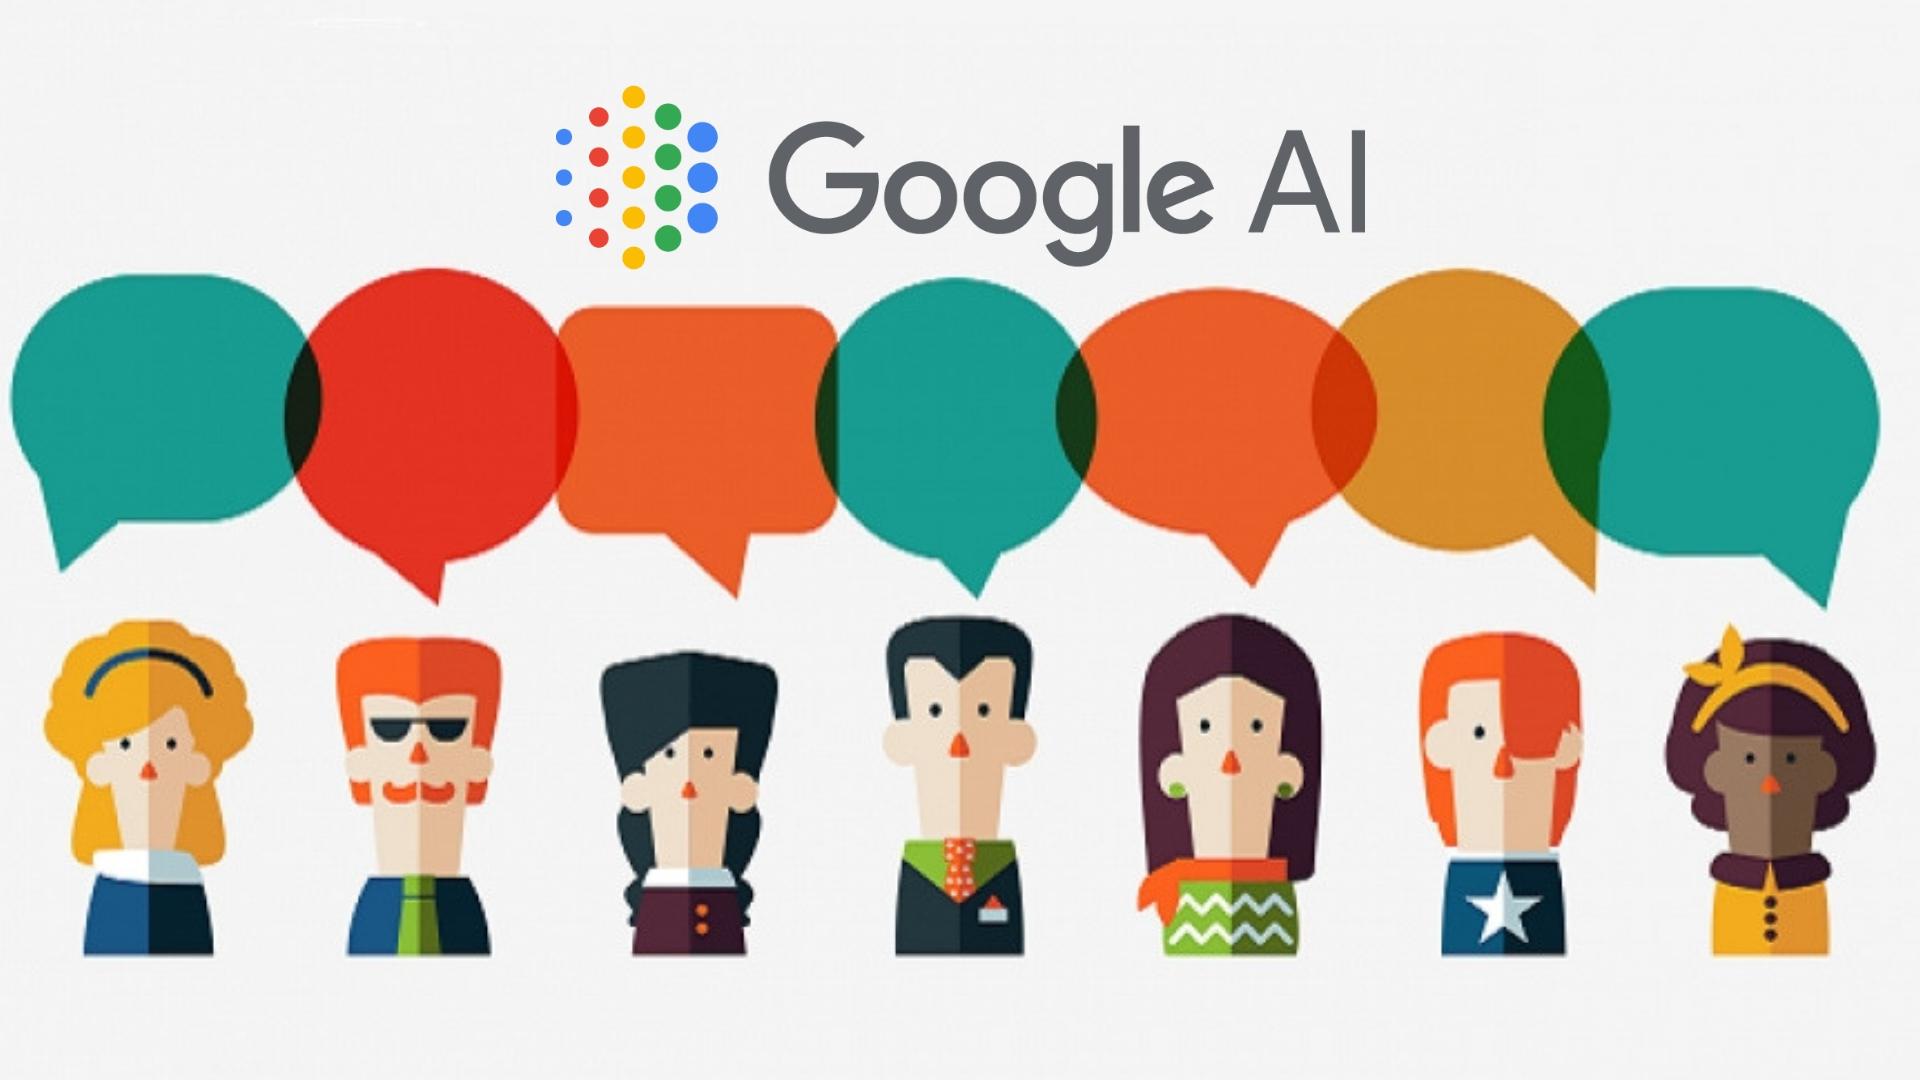 Best NLP Model Ever? Google BERT Sets New Standards in 11 Language